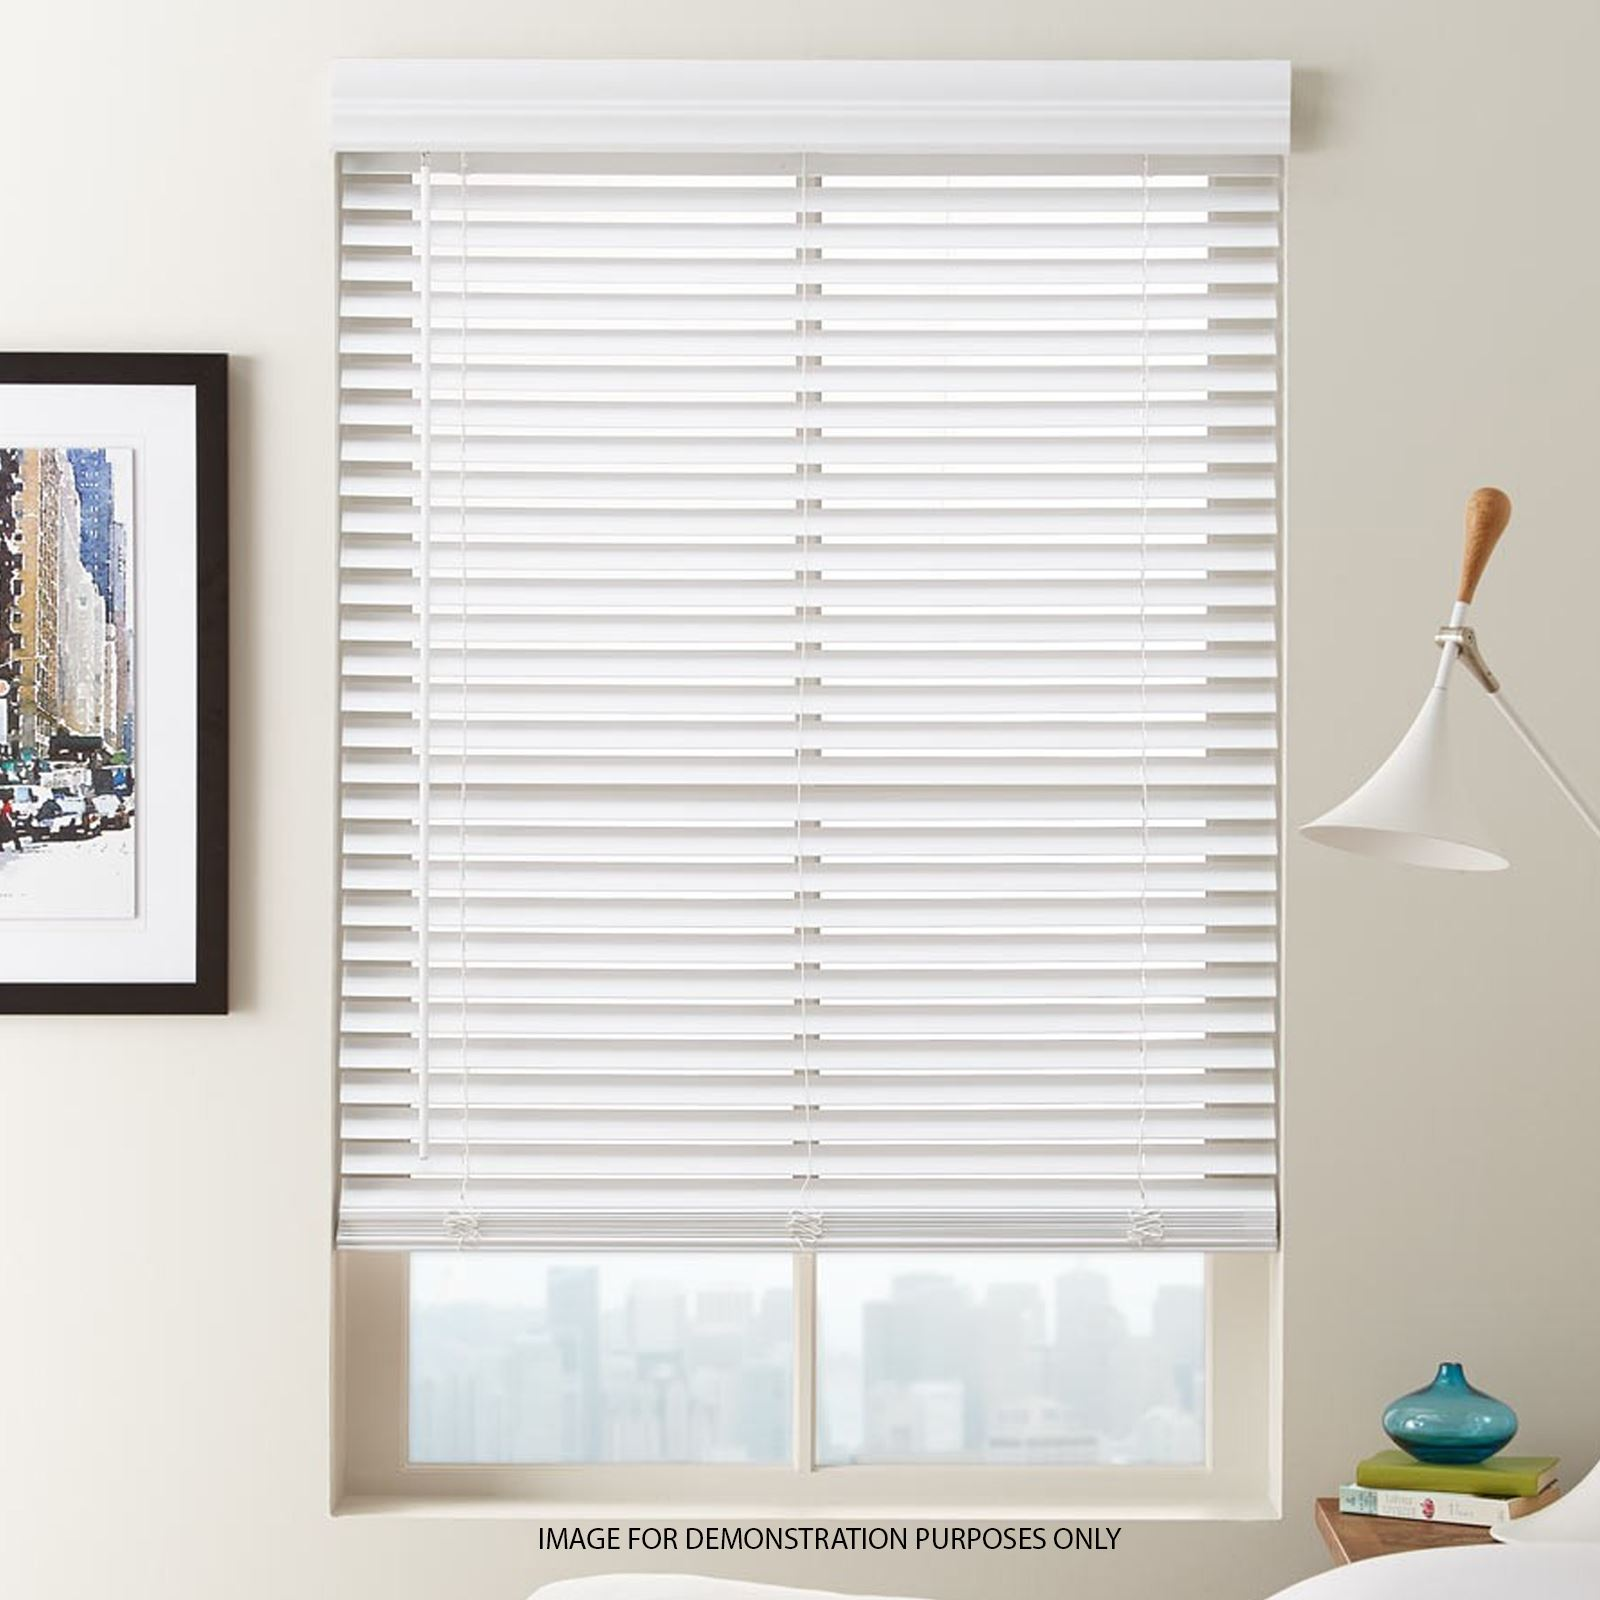 Venetian Blind Office Home Window Blinds Trim-able Easy Fit Drop 210cm Cream PVC